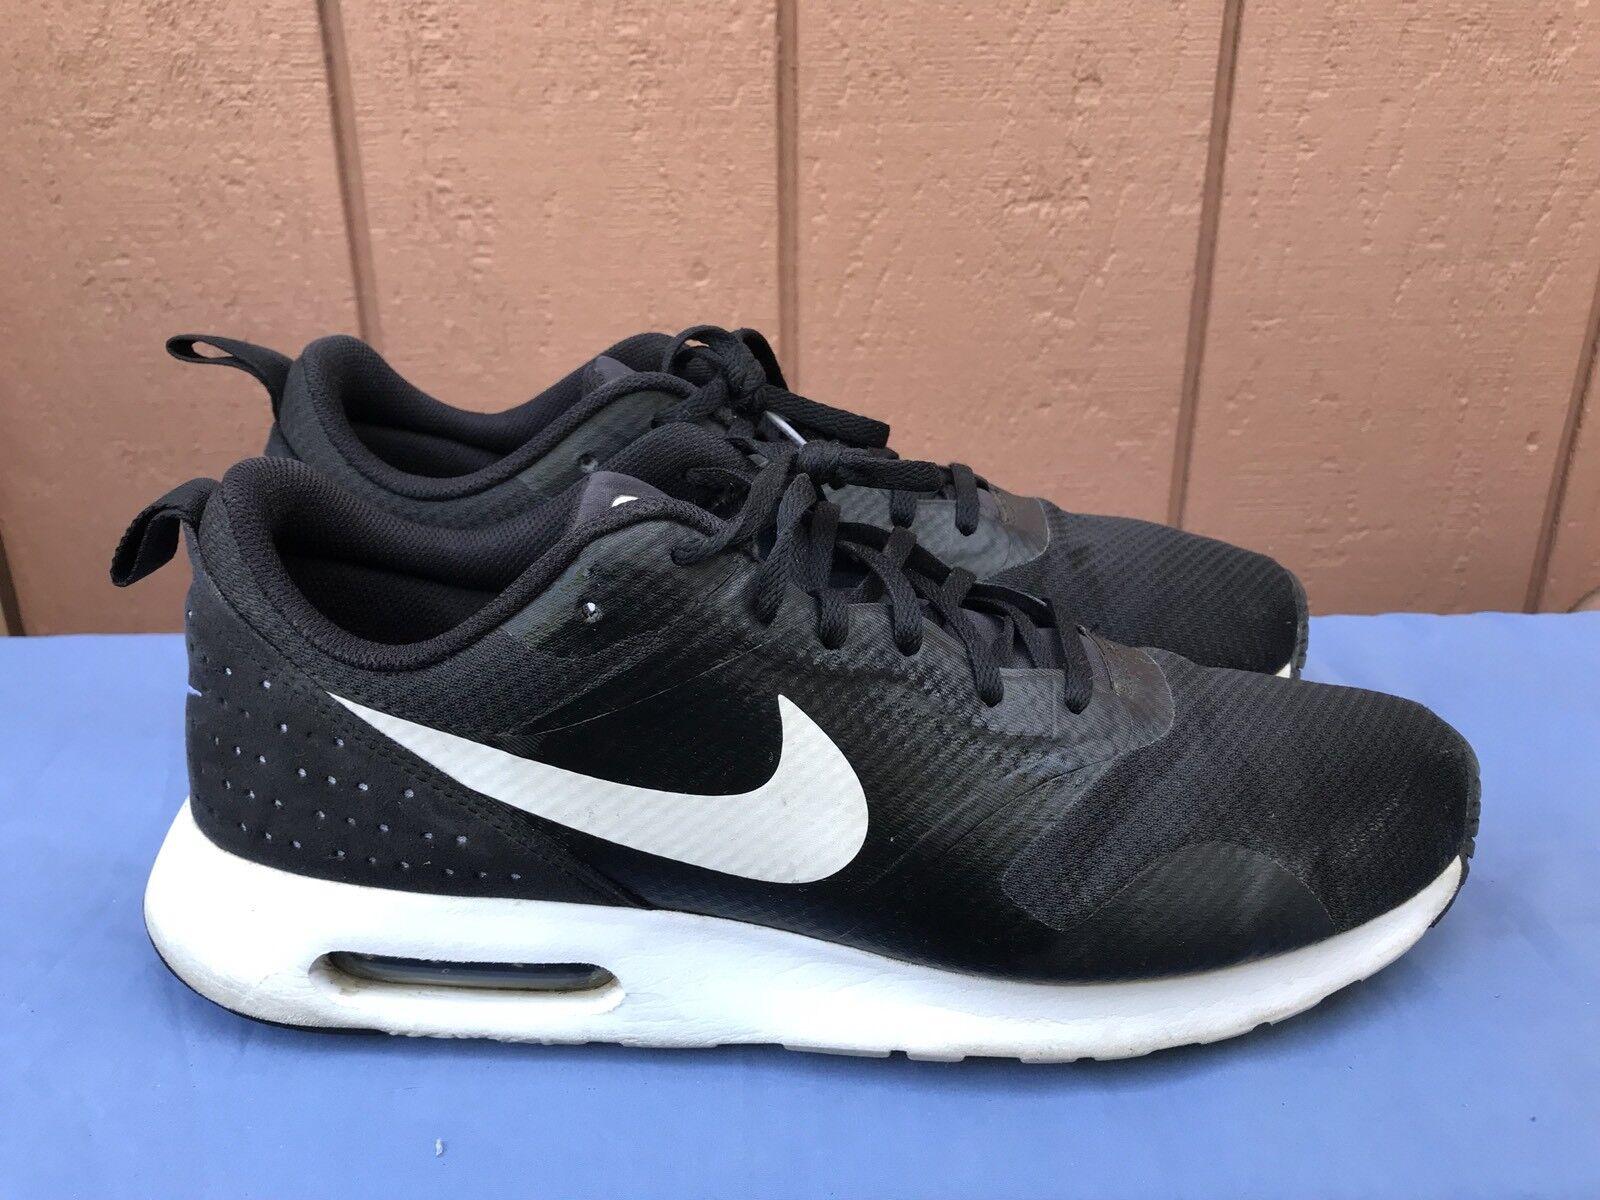 EUC Nike Air Blanco-Negro Max Tavas negro / Blanco-Negro Air nosotros 13 705149 009 running zapatos A4 c5ddbc